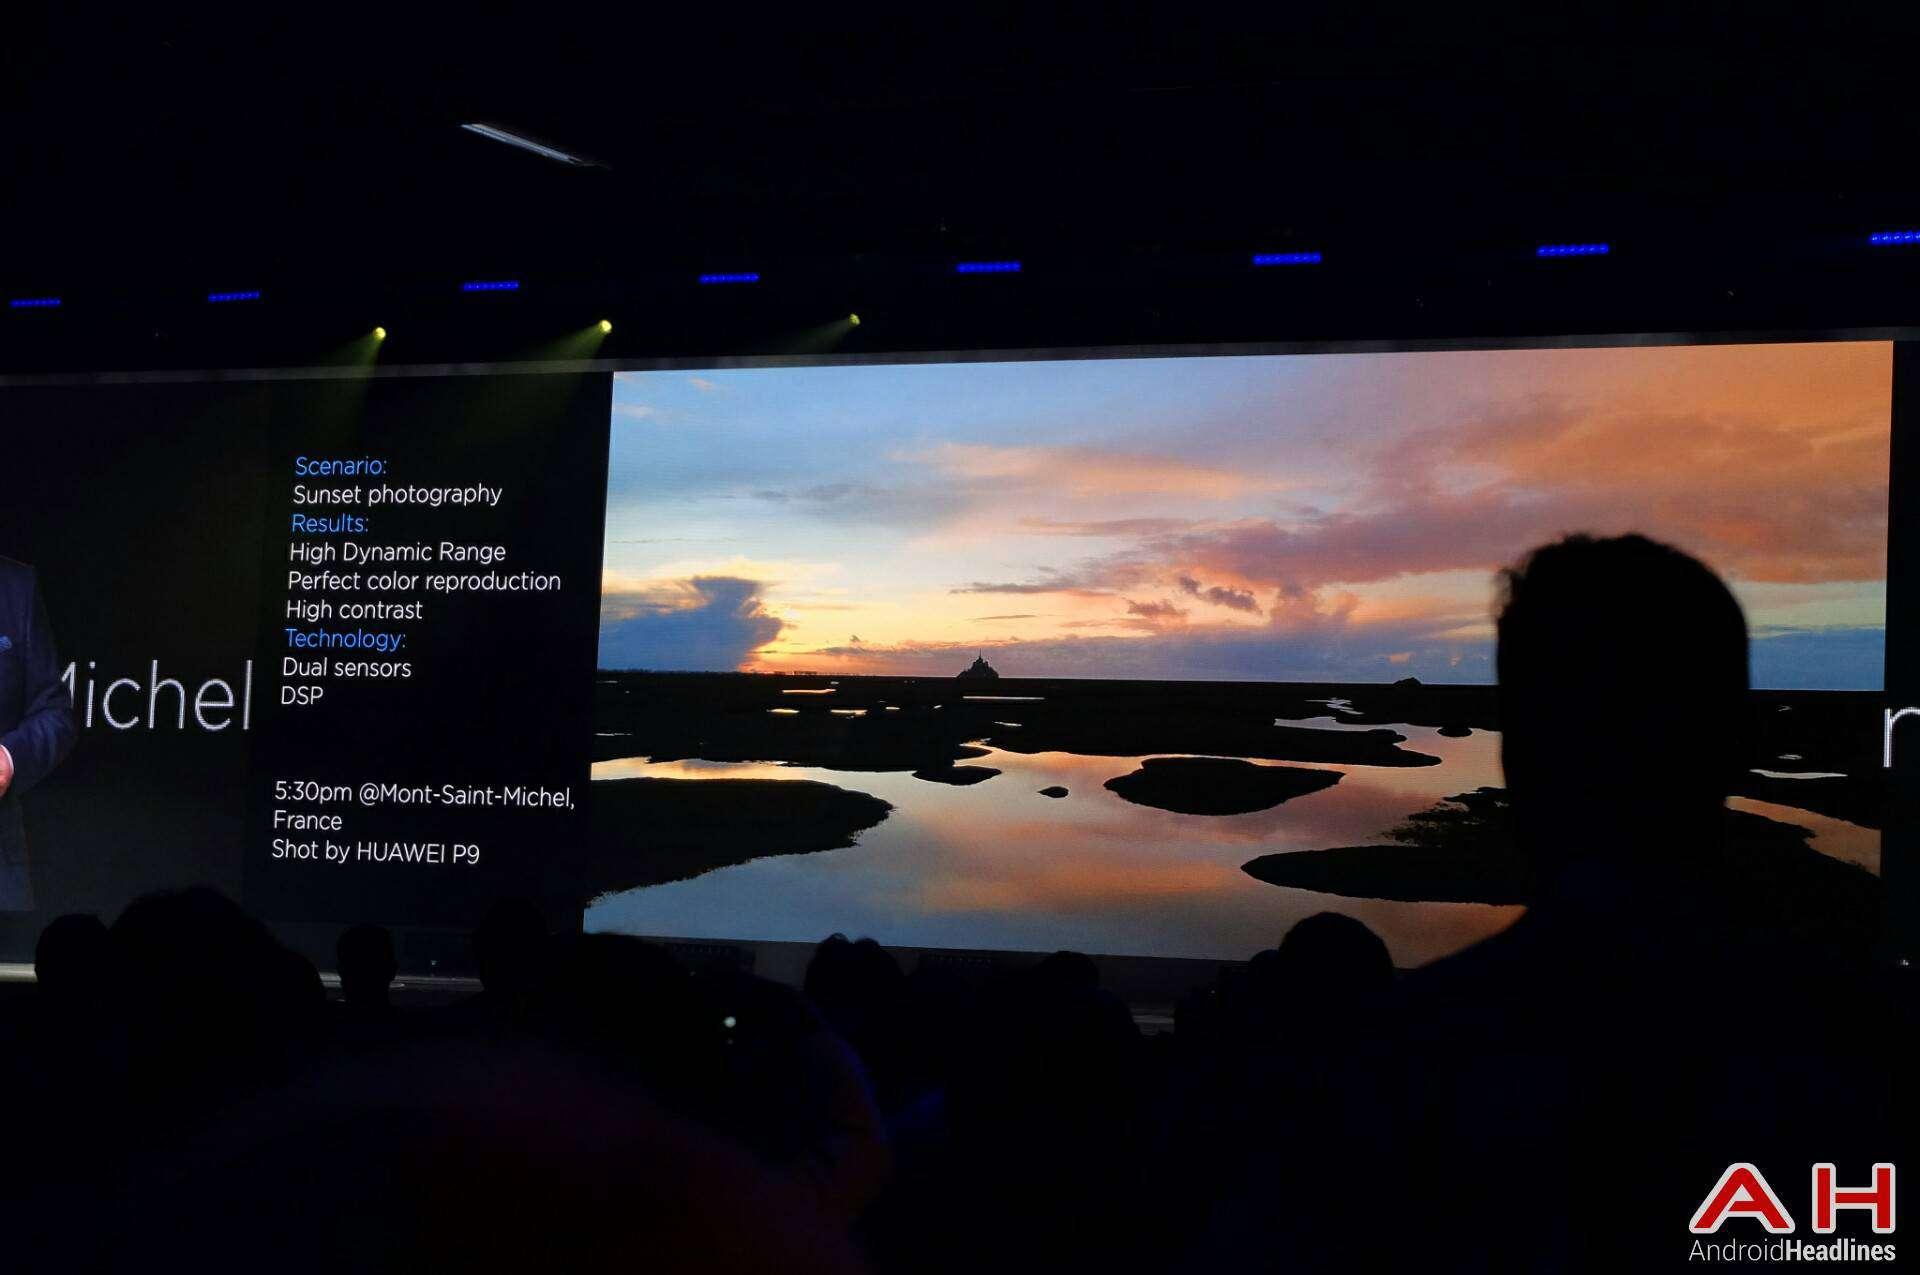 Huawei P9 camera 12